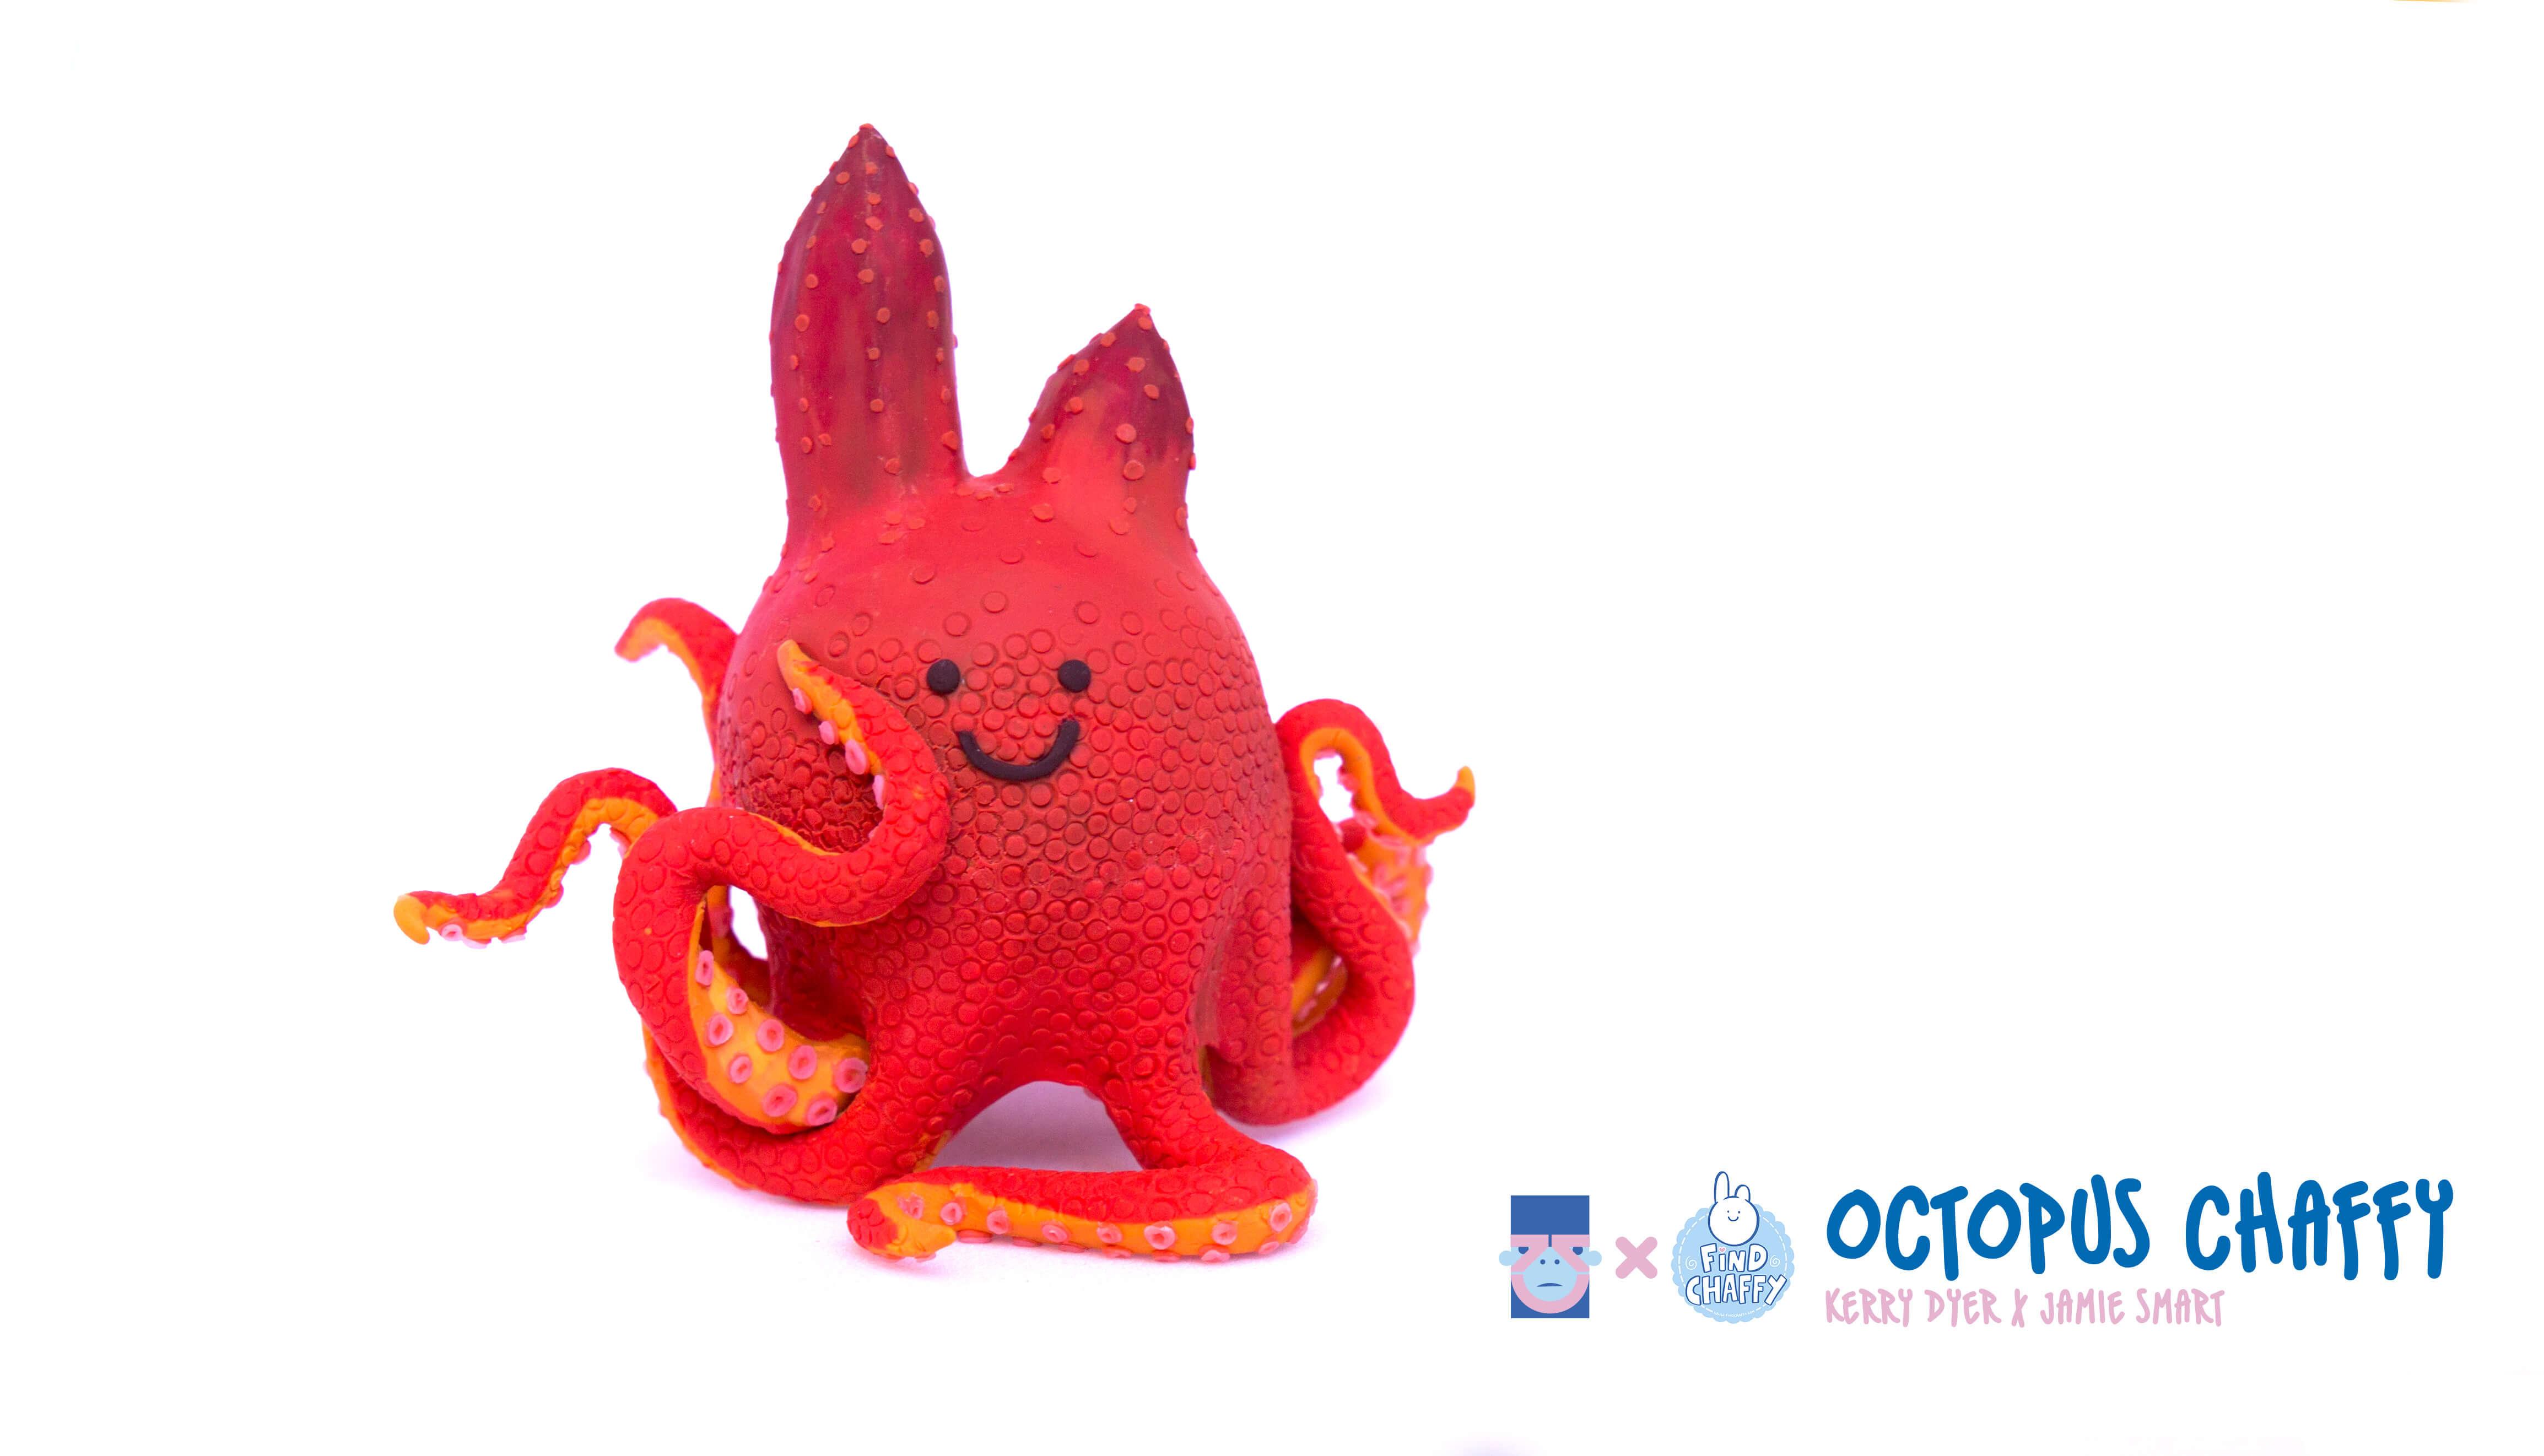 Octopus-Chaffy.2